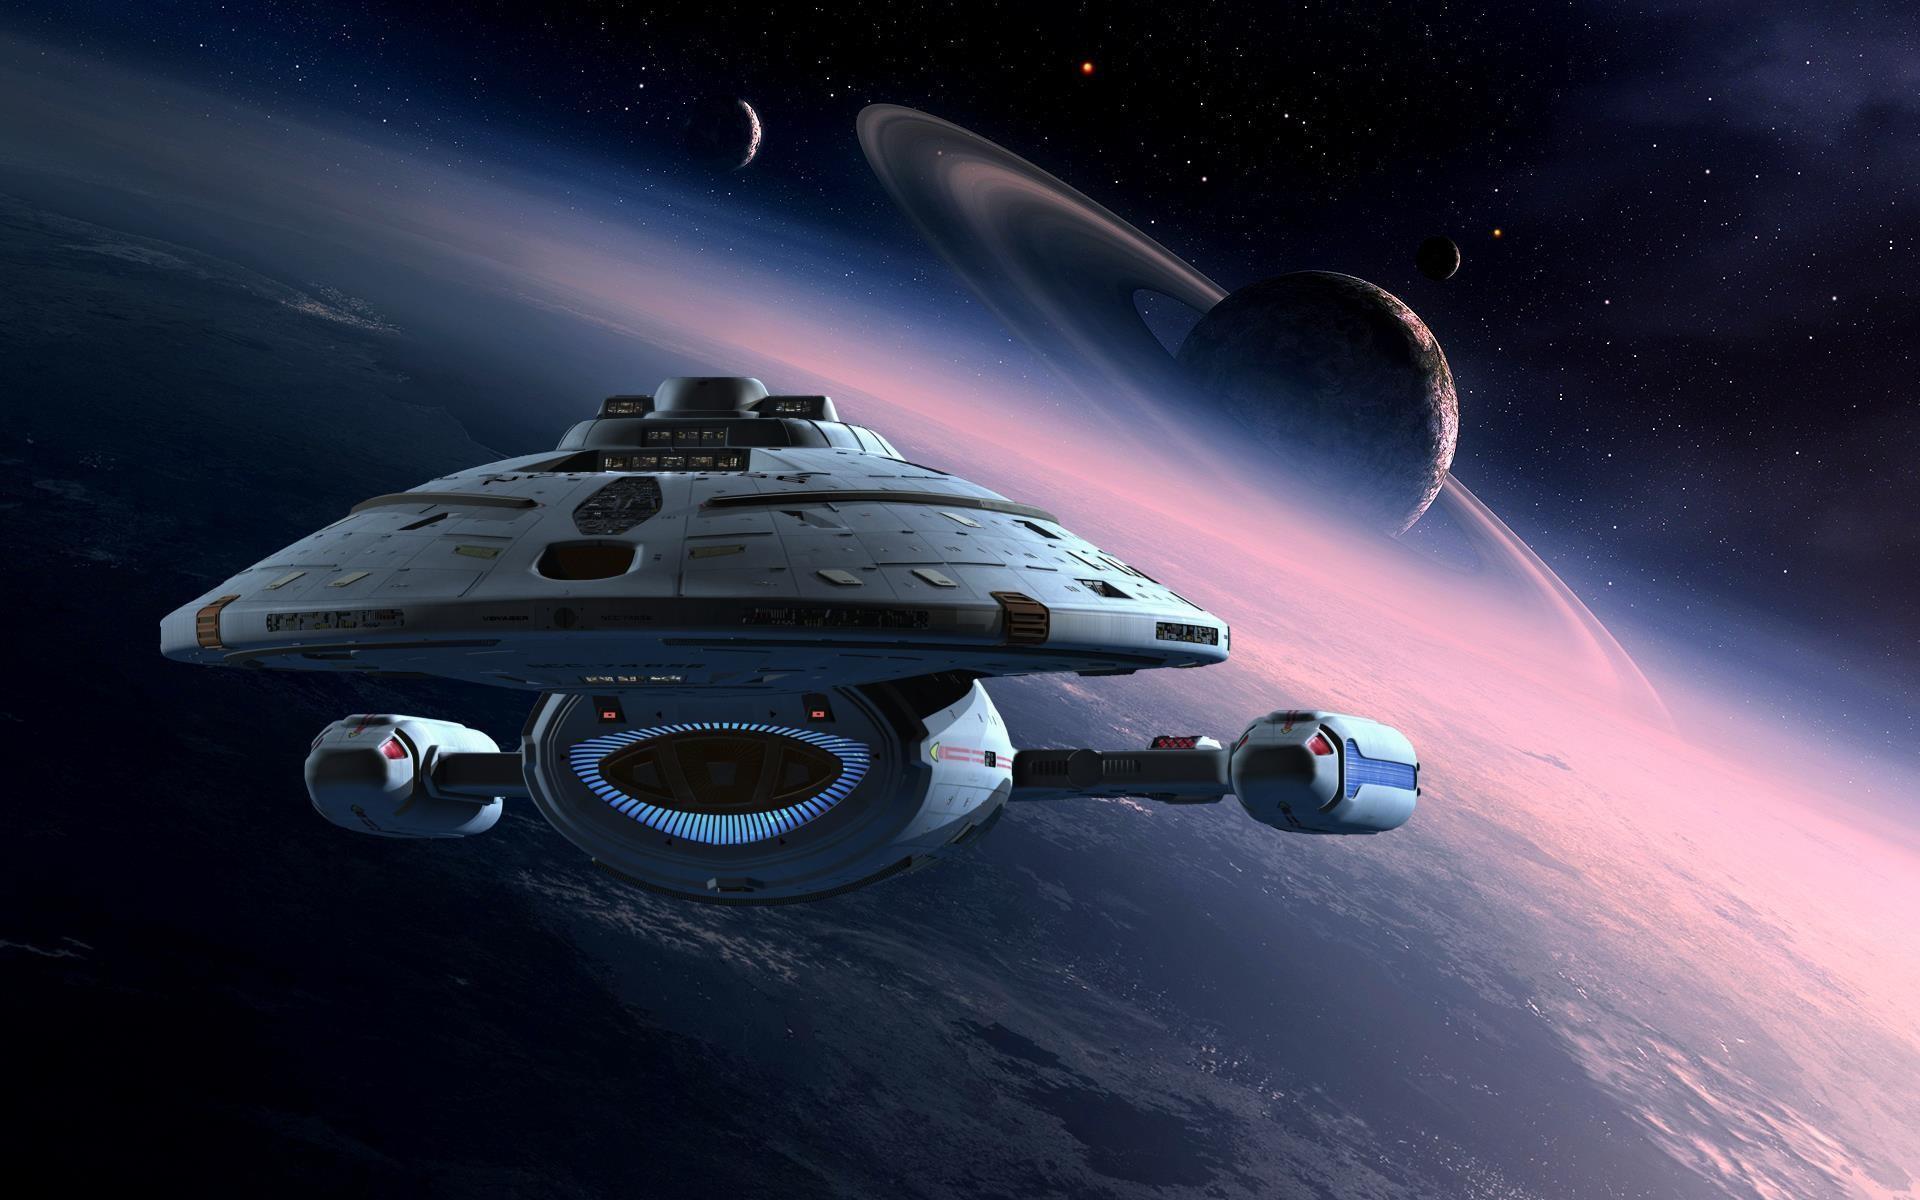 My current wallpaper [Star Trek: Voyager]